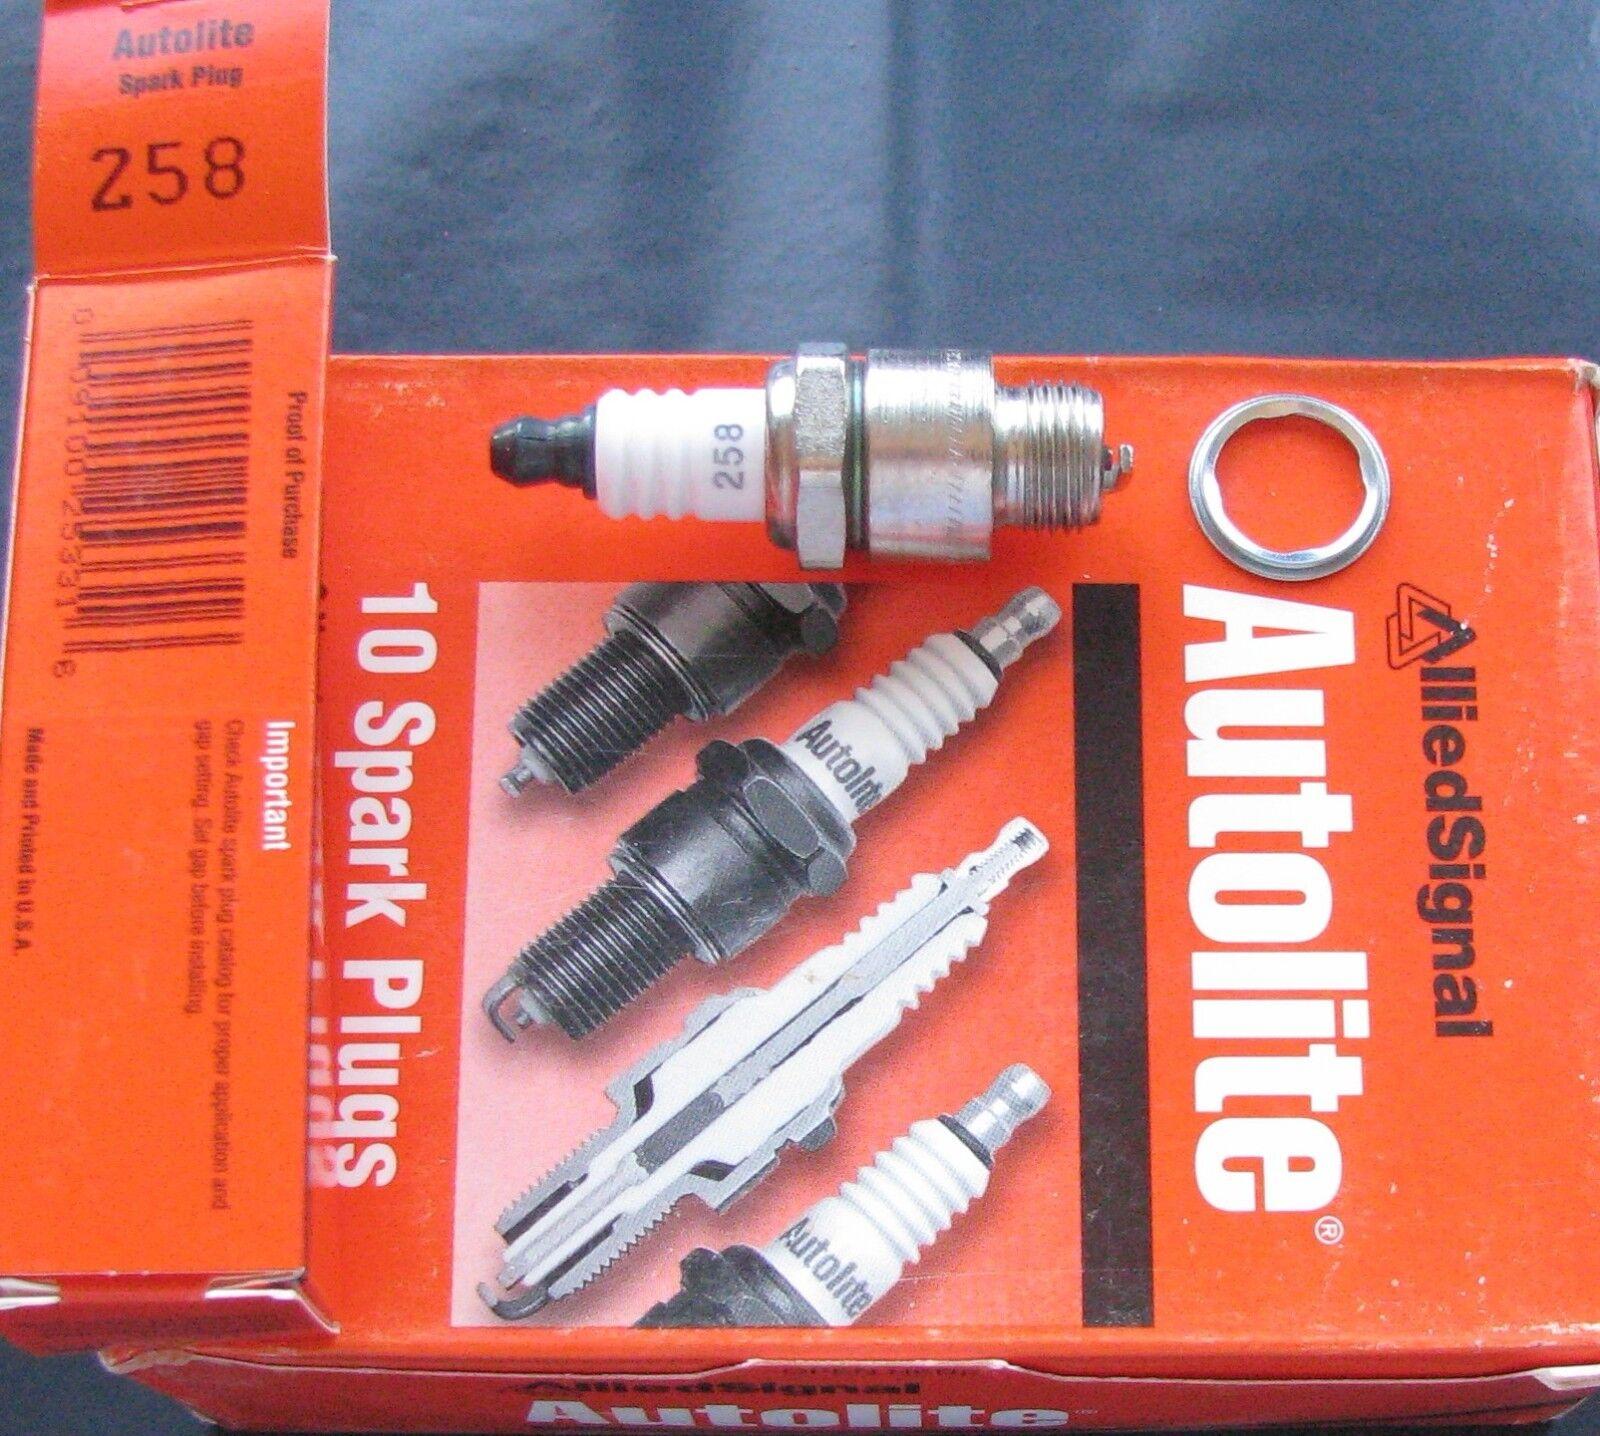 Set of 8 NGK Standard Spark Plugs Kawasaki MULE 2510 GAS 2005-1993 Engine 620cc